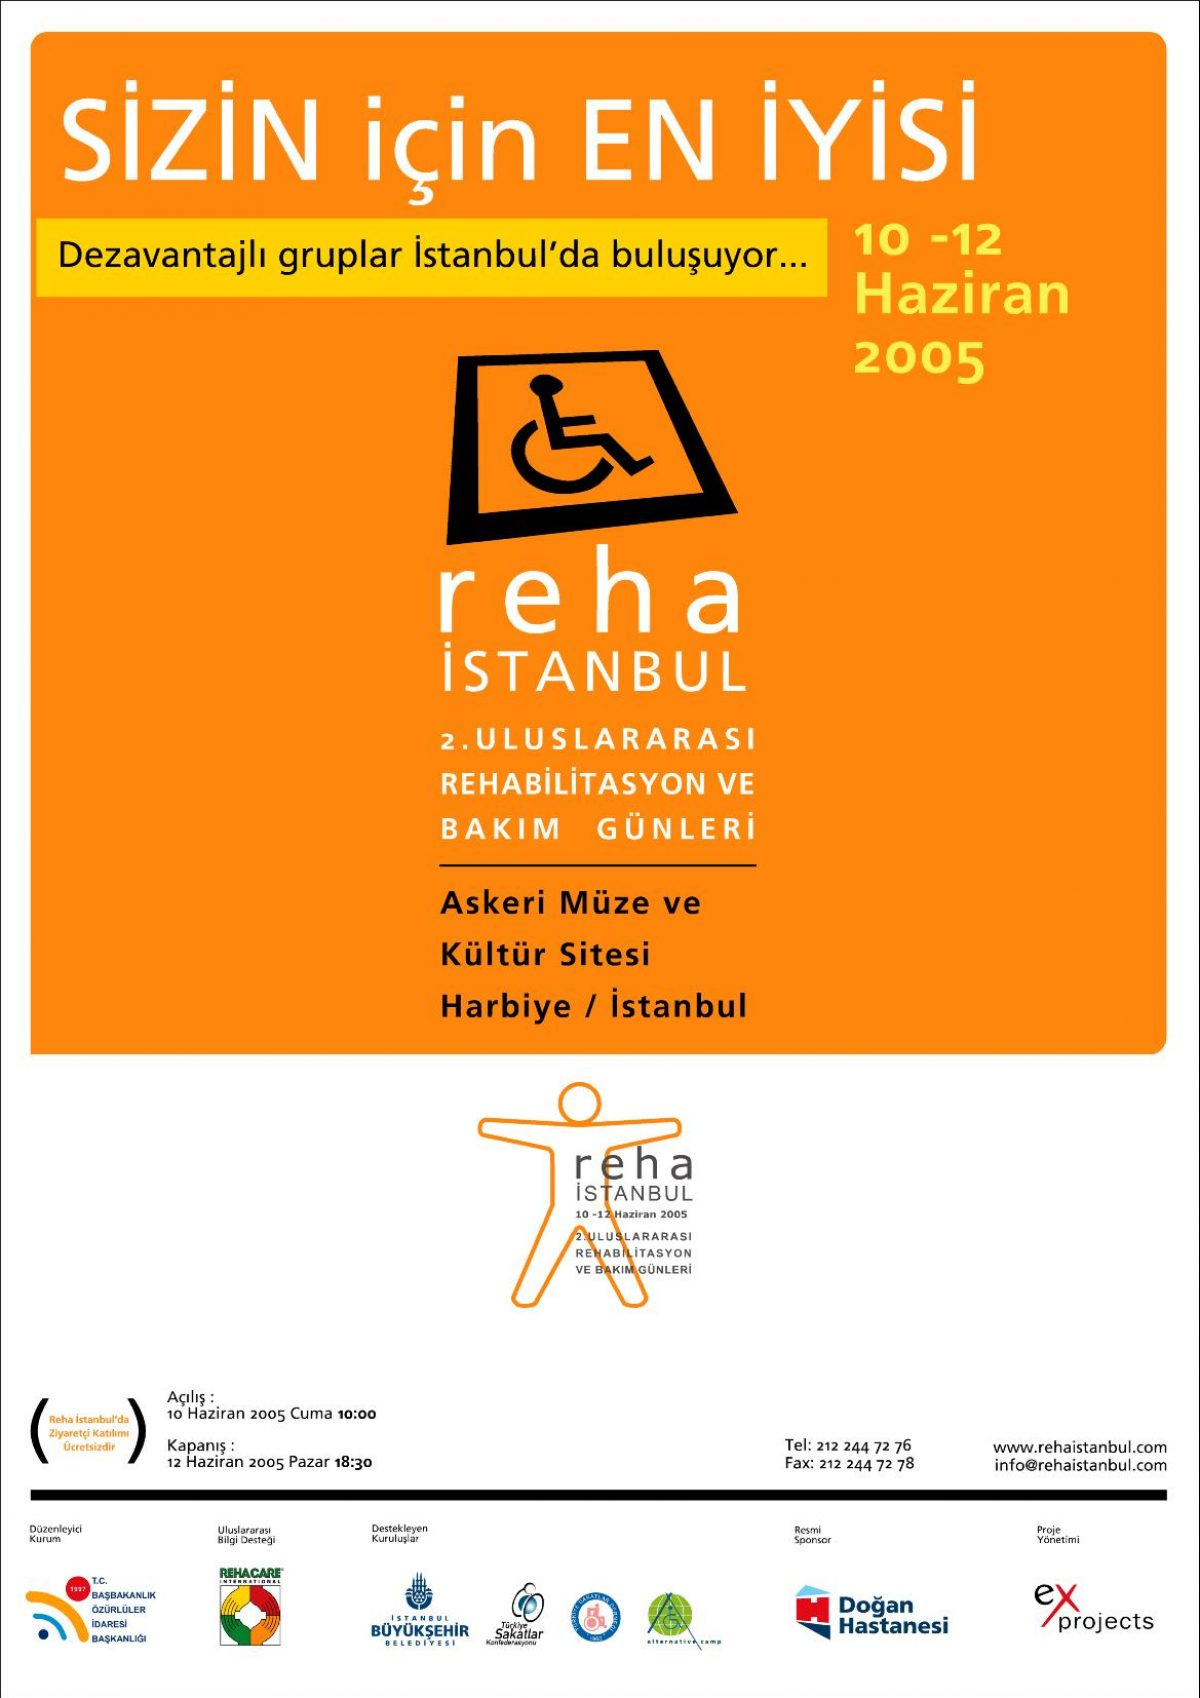 reha istanbul 2005 afis